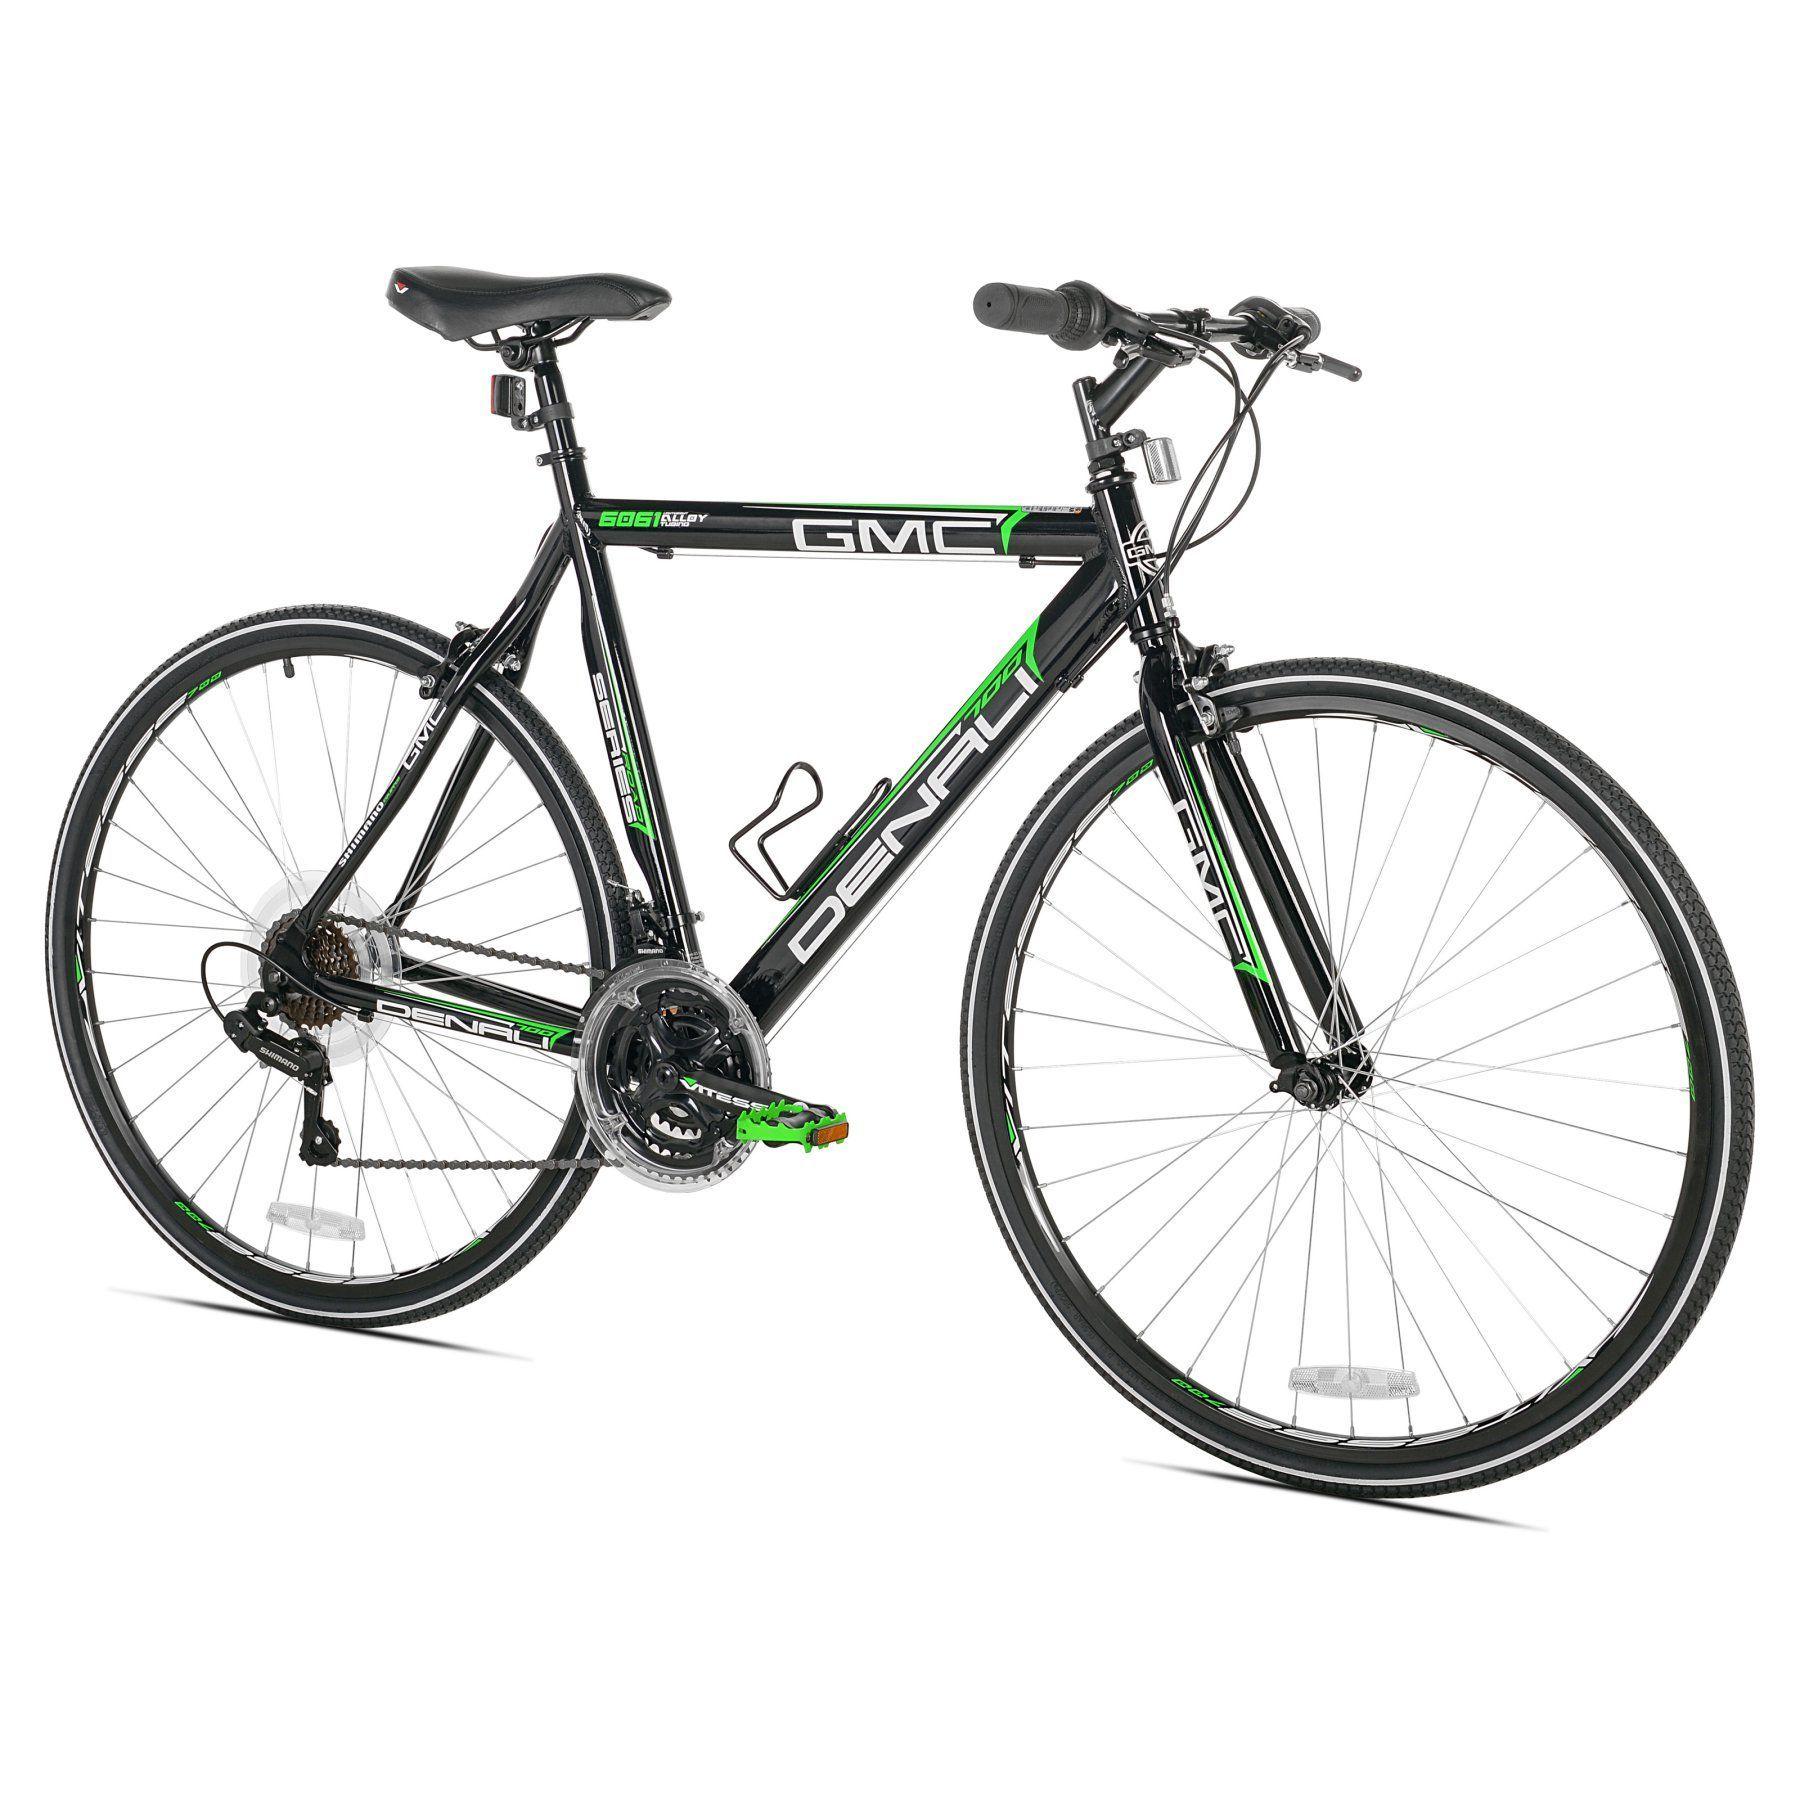 Gmc Denali Flat Bar Road Bike Small 52770 Flat Bar Road Bike